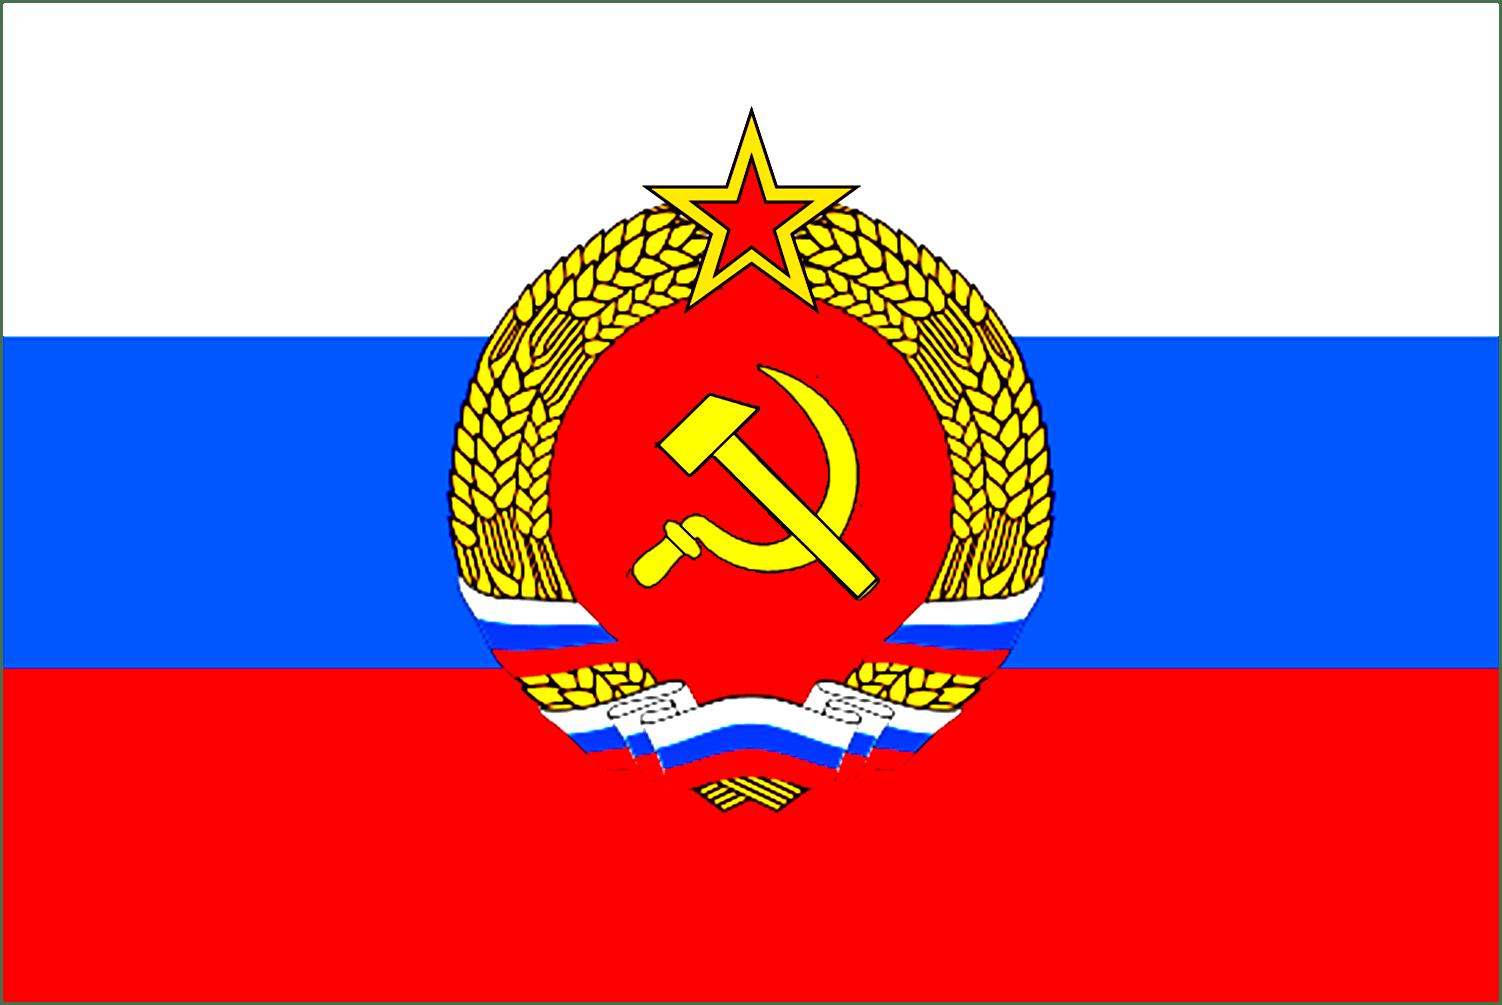 Russia Not The Ussr West No Longer Capitalist Democratic